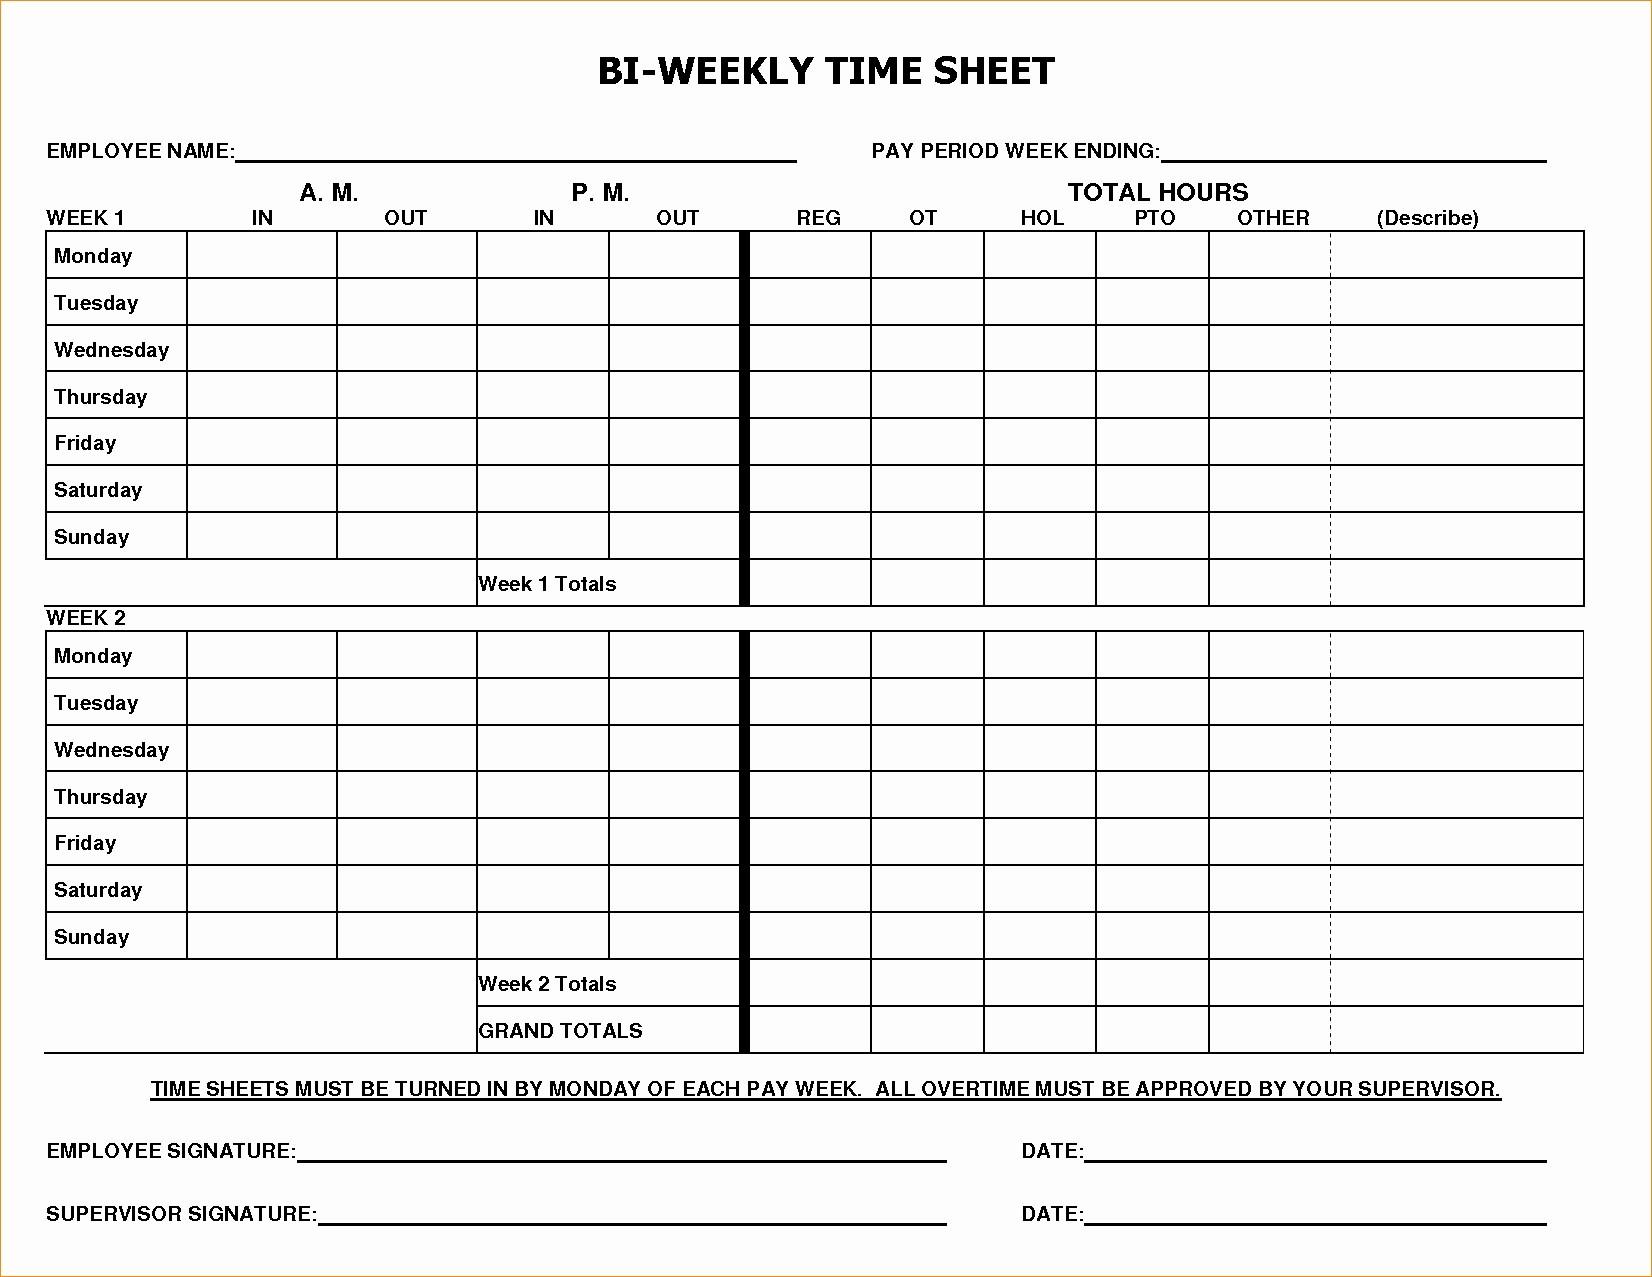 Free Employee Time Tracking Spreadsheet Inspirational Weekly Timesheet Spreadsheet